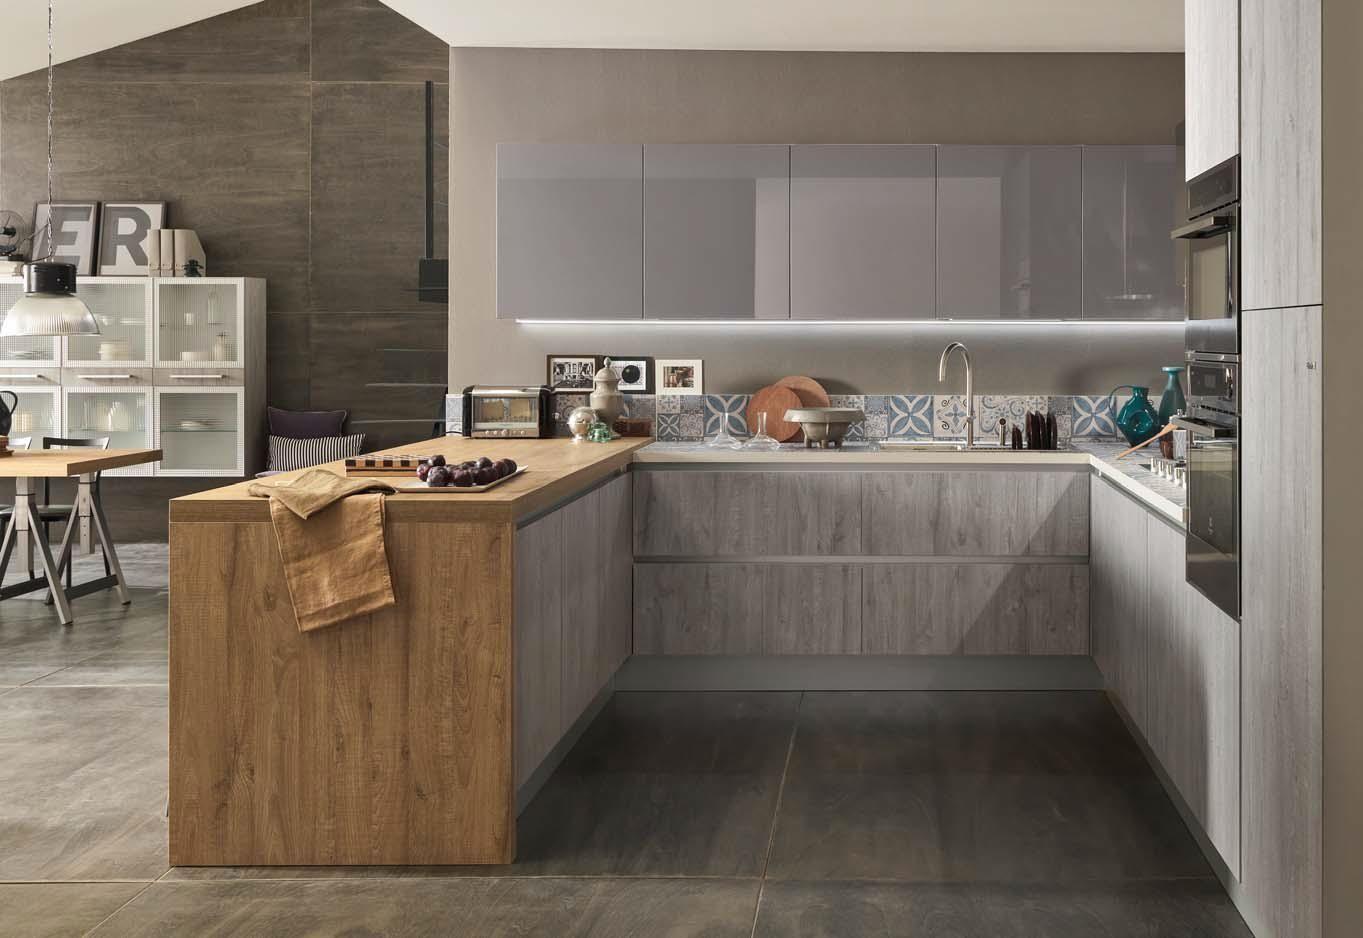 Trainotti Design Arredo Casa Cucine Febal Arredo Interni